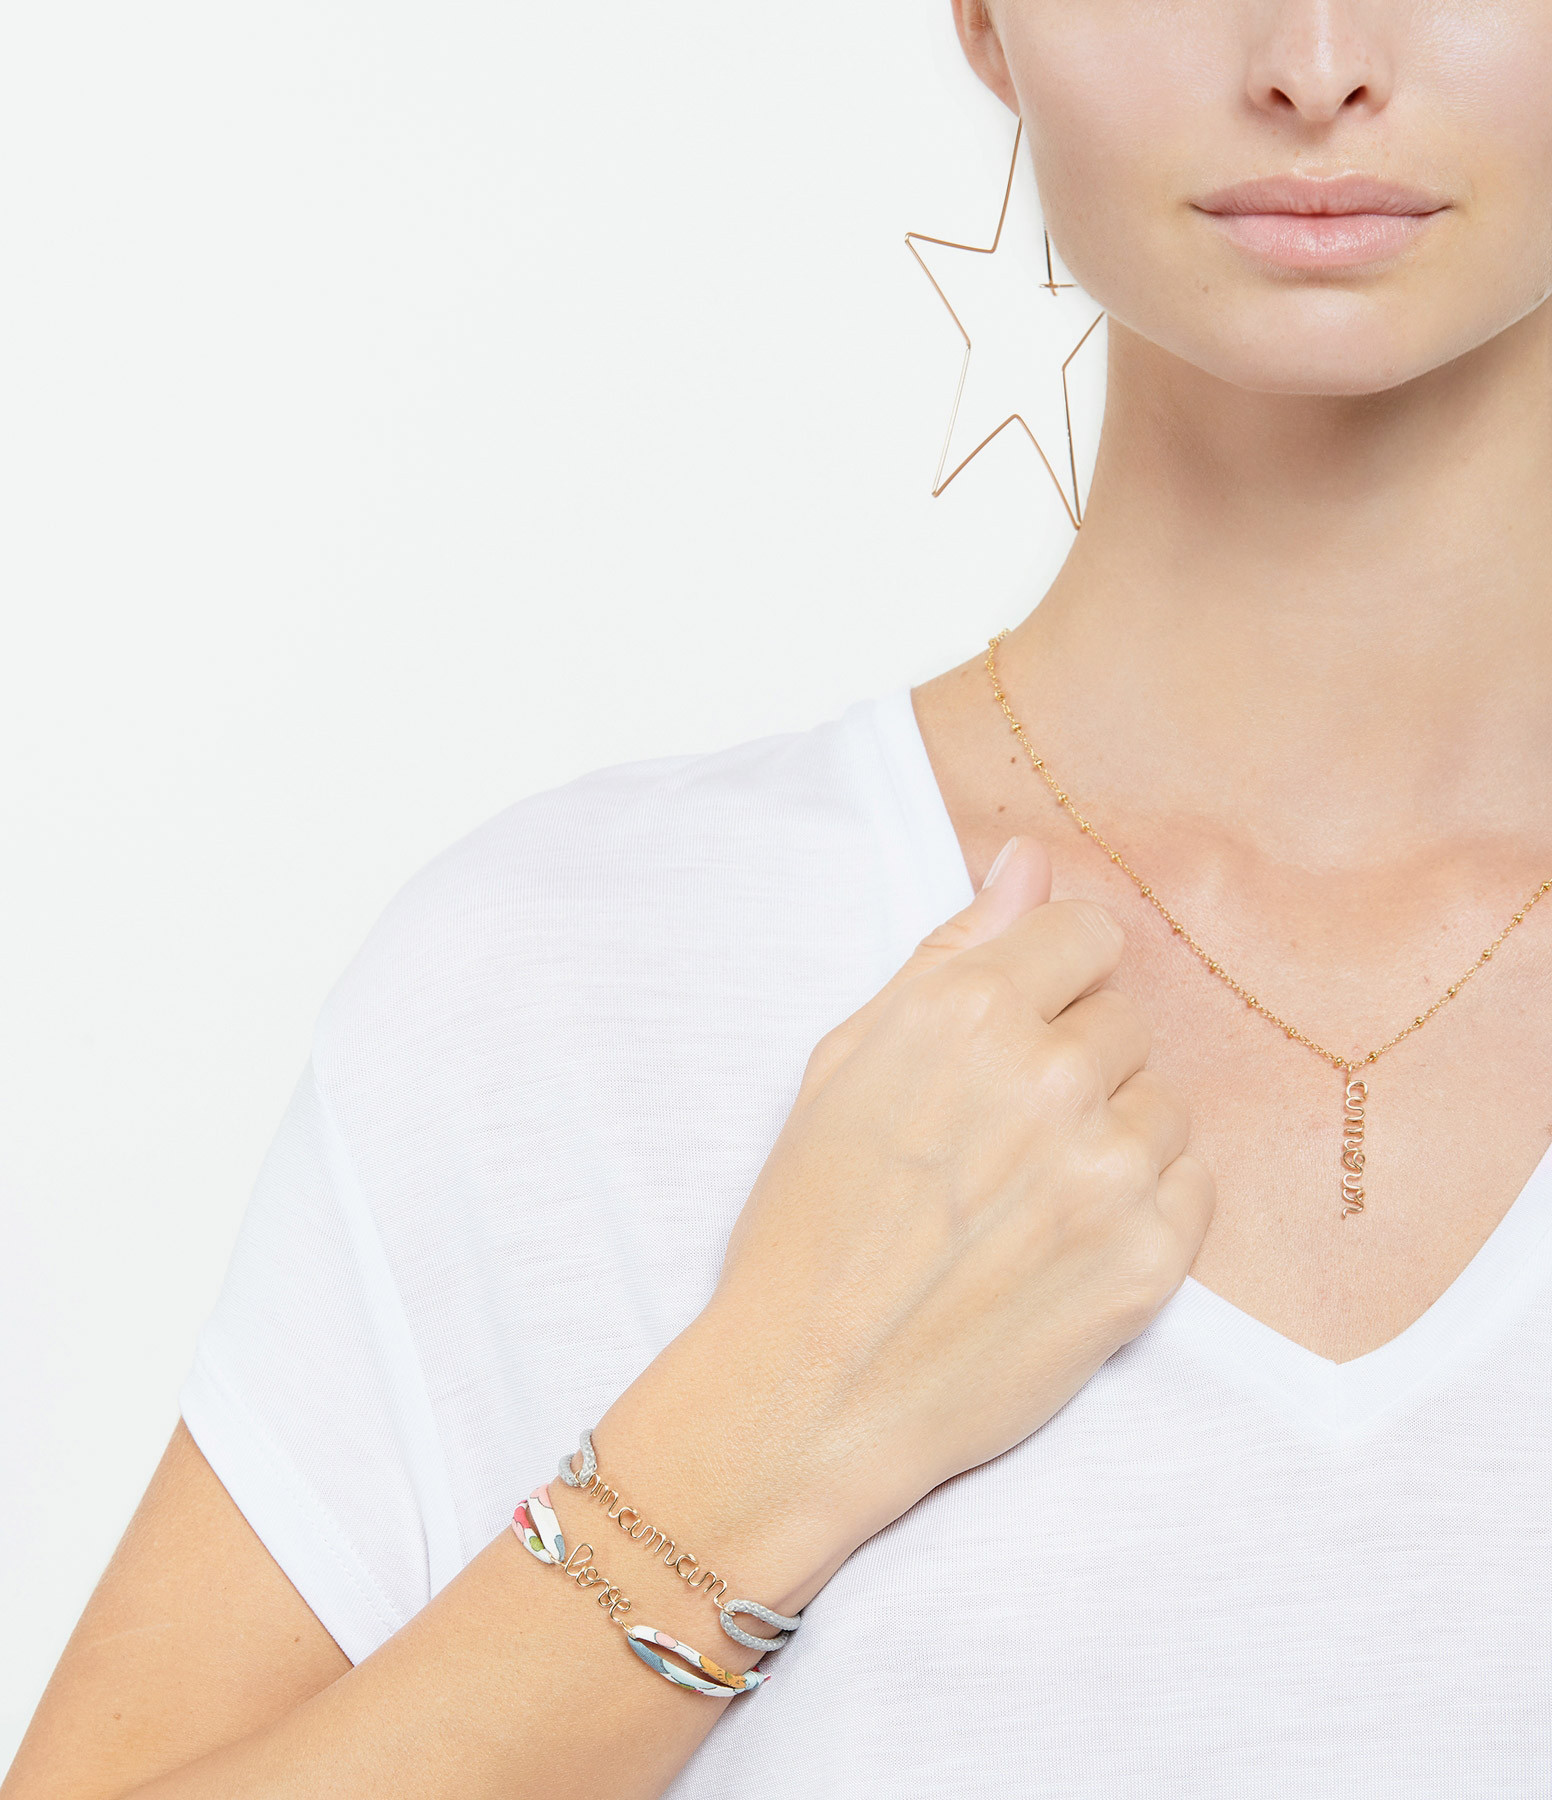 ATELIER PAULIN - Bracelets Duo Love Coeur Gold Filled 14K Céladon